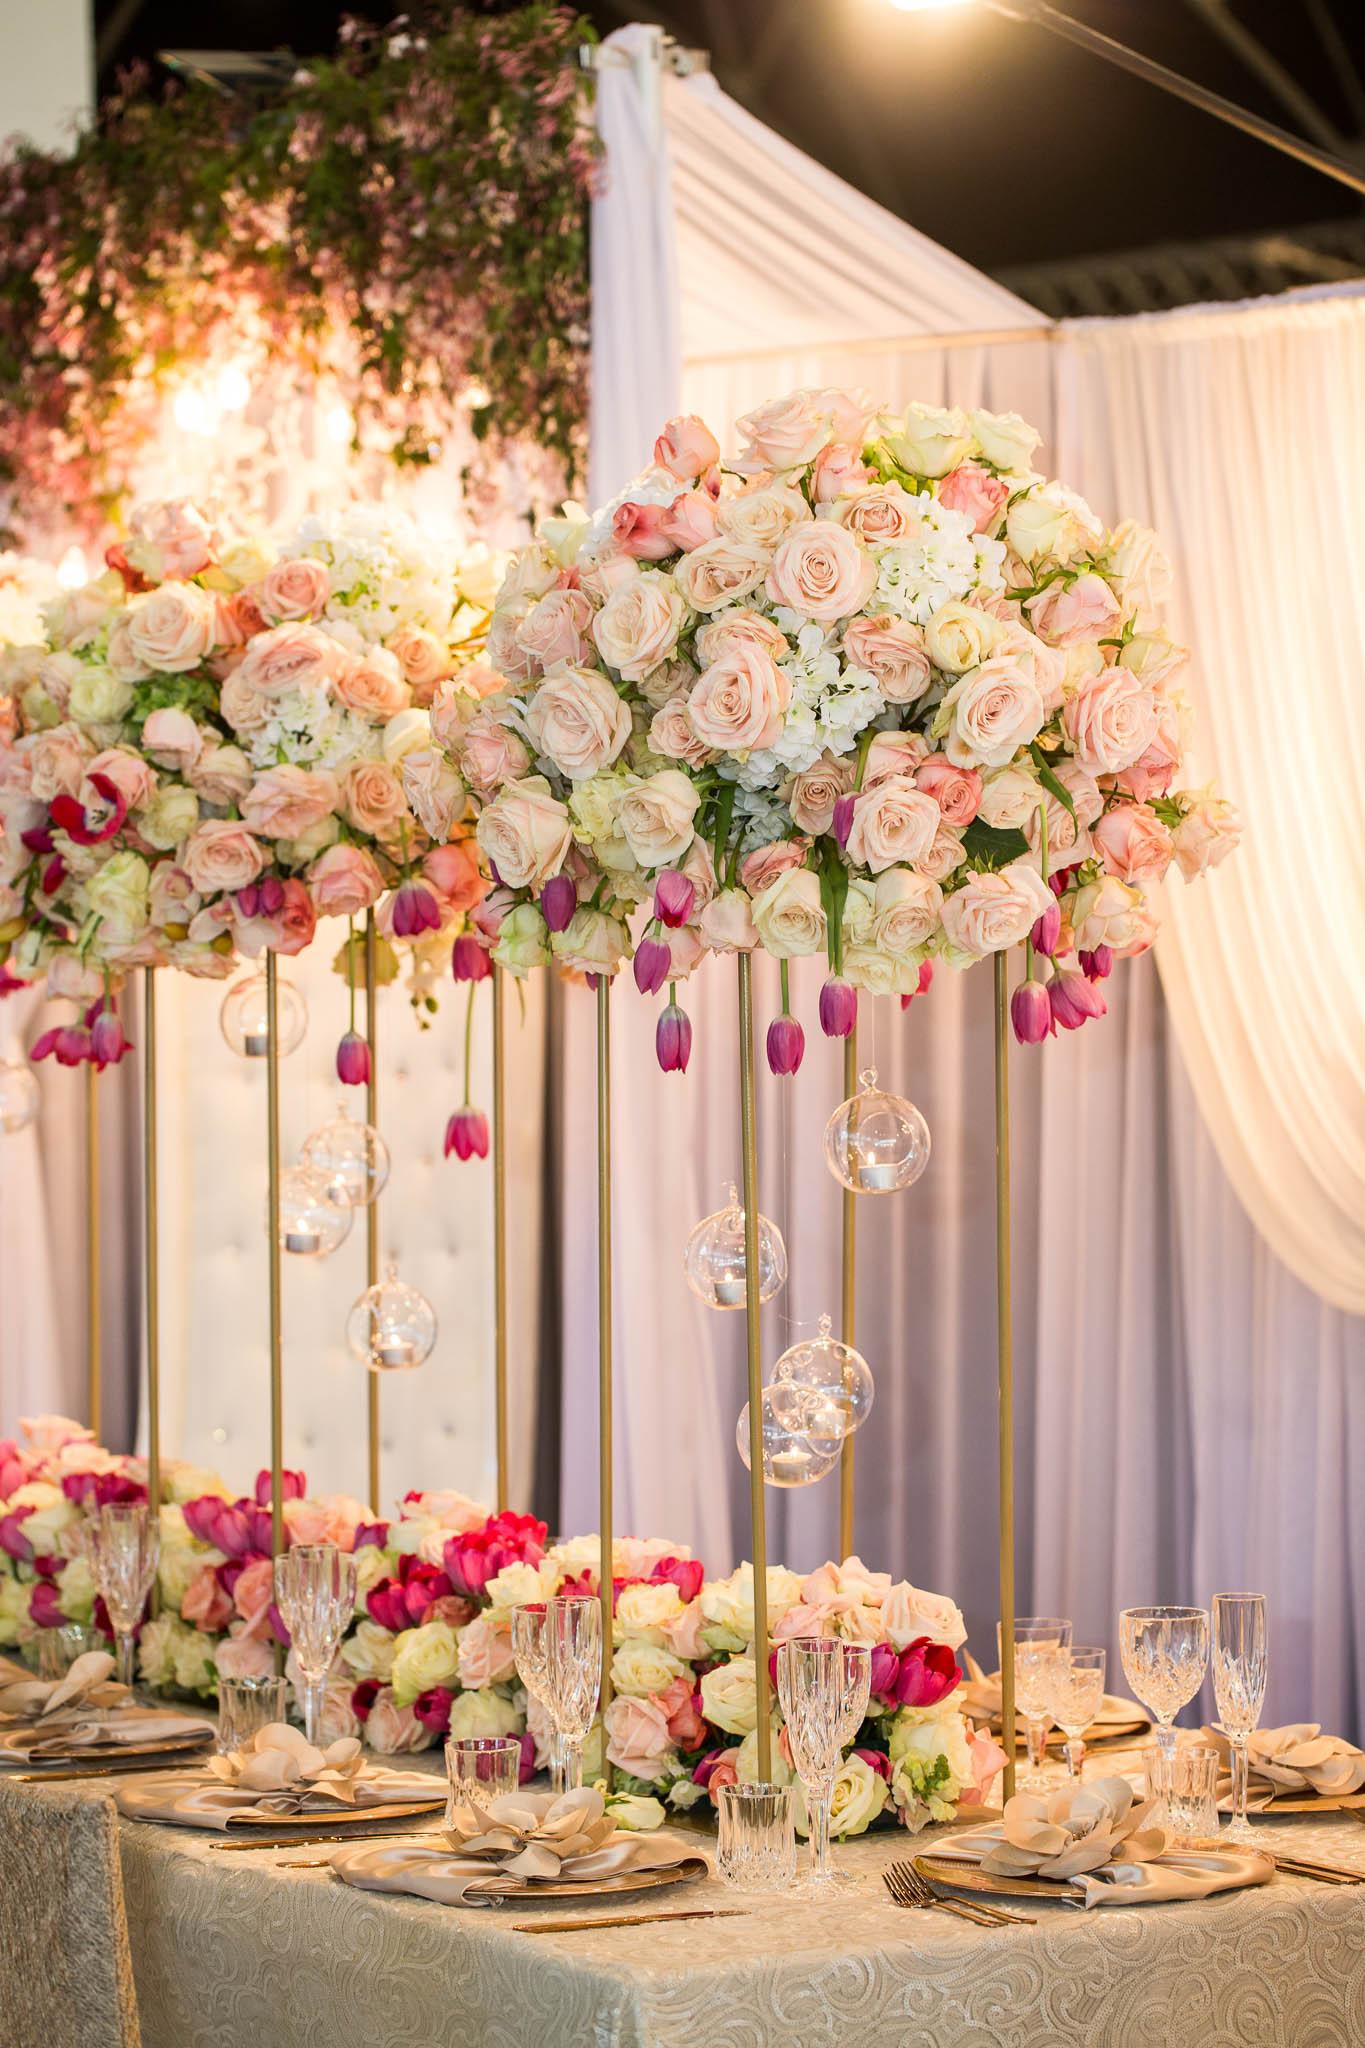 gold_carly_stand_fresh_floral_wedding_centrepiece.jpg